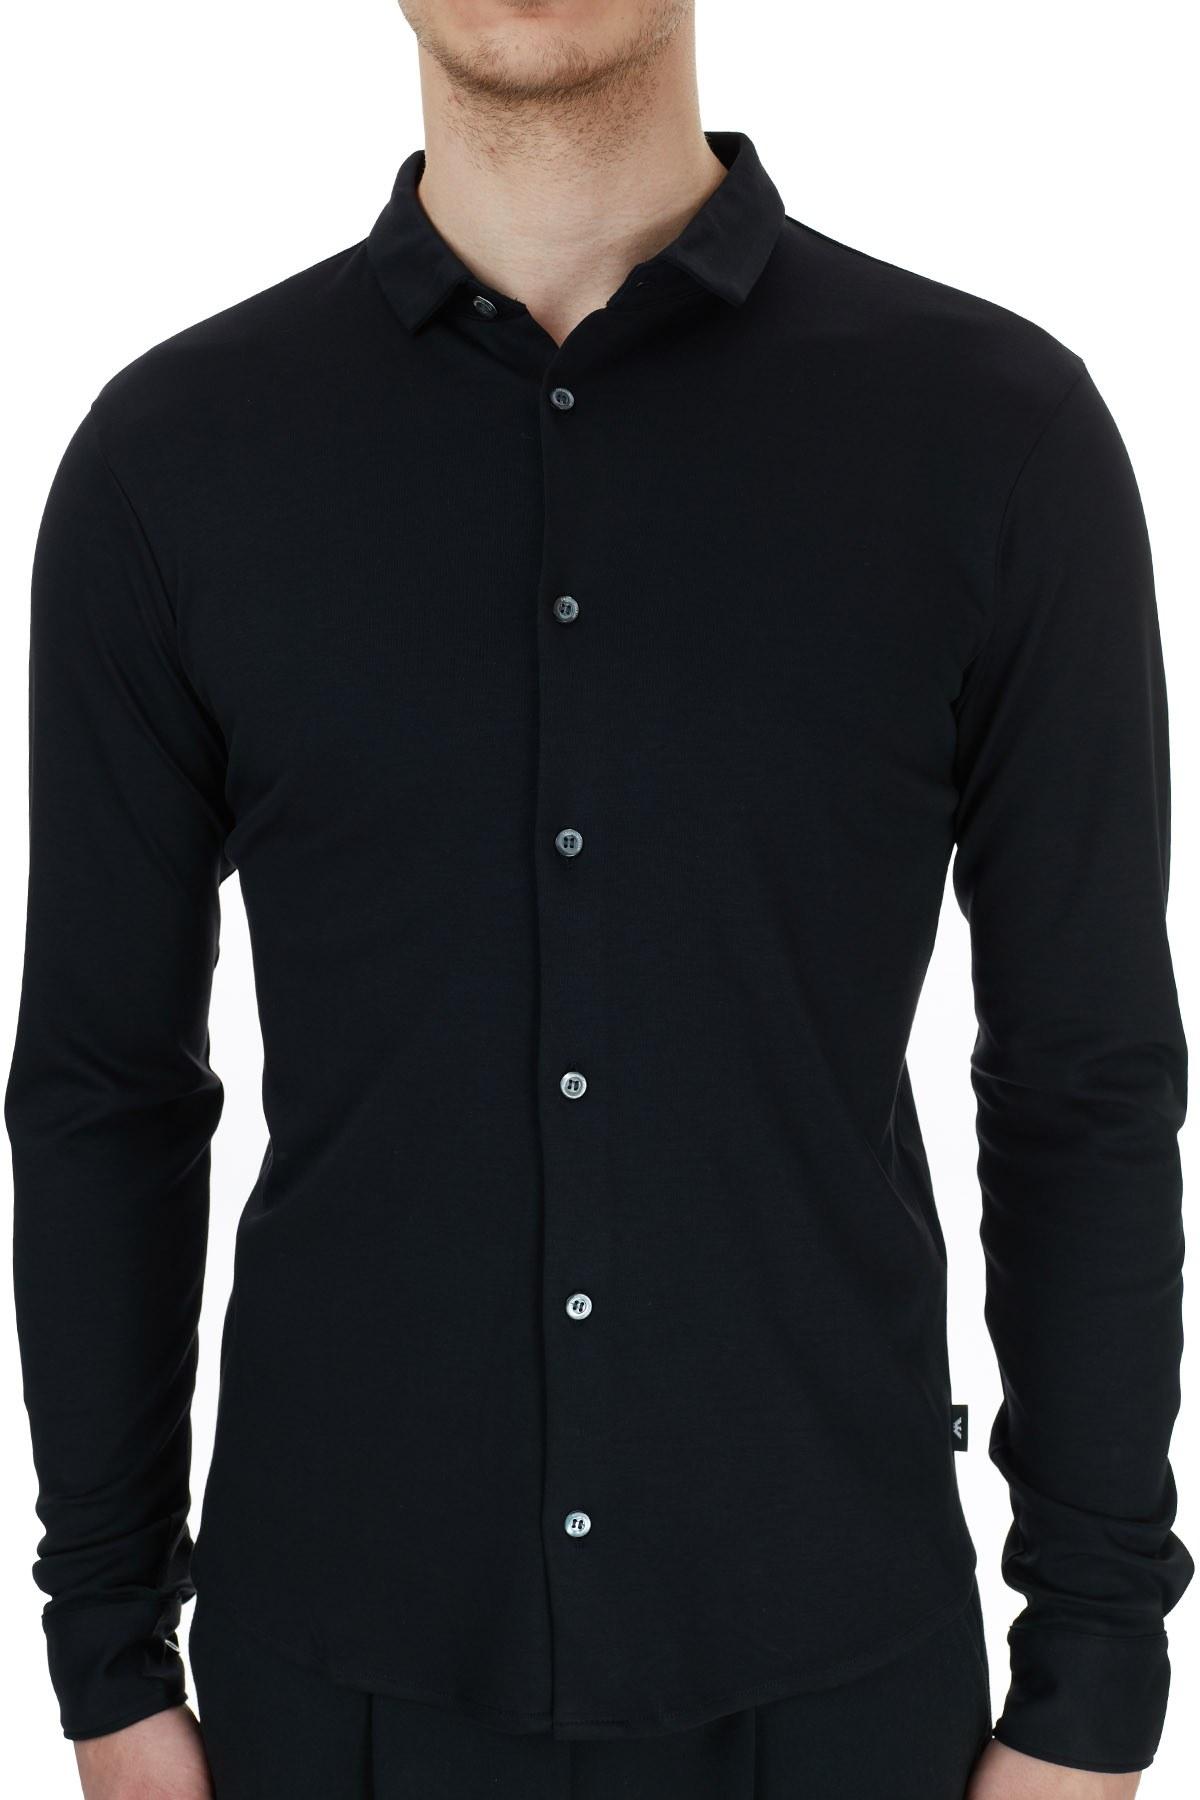 Emporio Armani Regular Fit Düz Yaka % 100 Pamuk Erkek Gömlek 8N1CH6 1JPRZ 0999 SİYAH